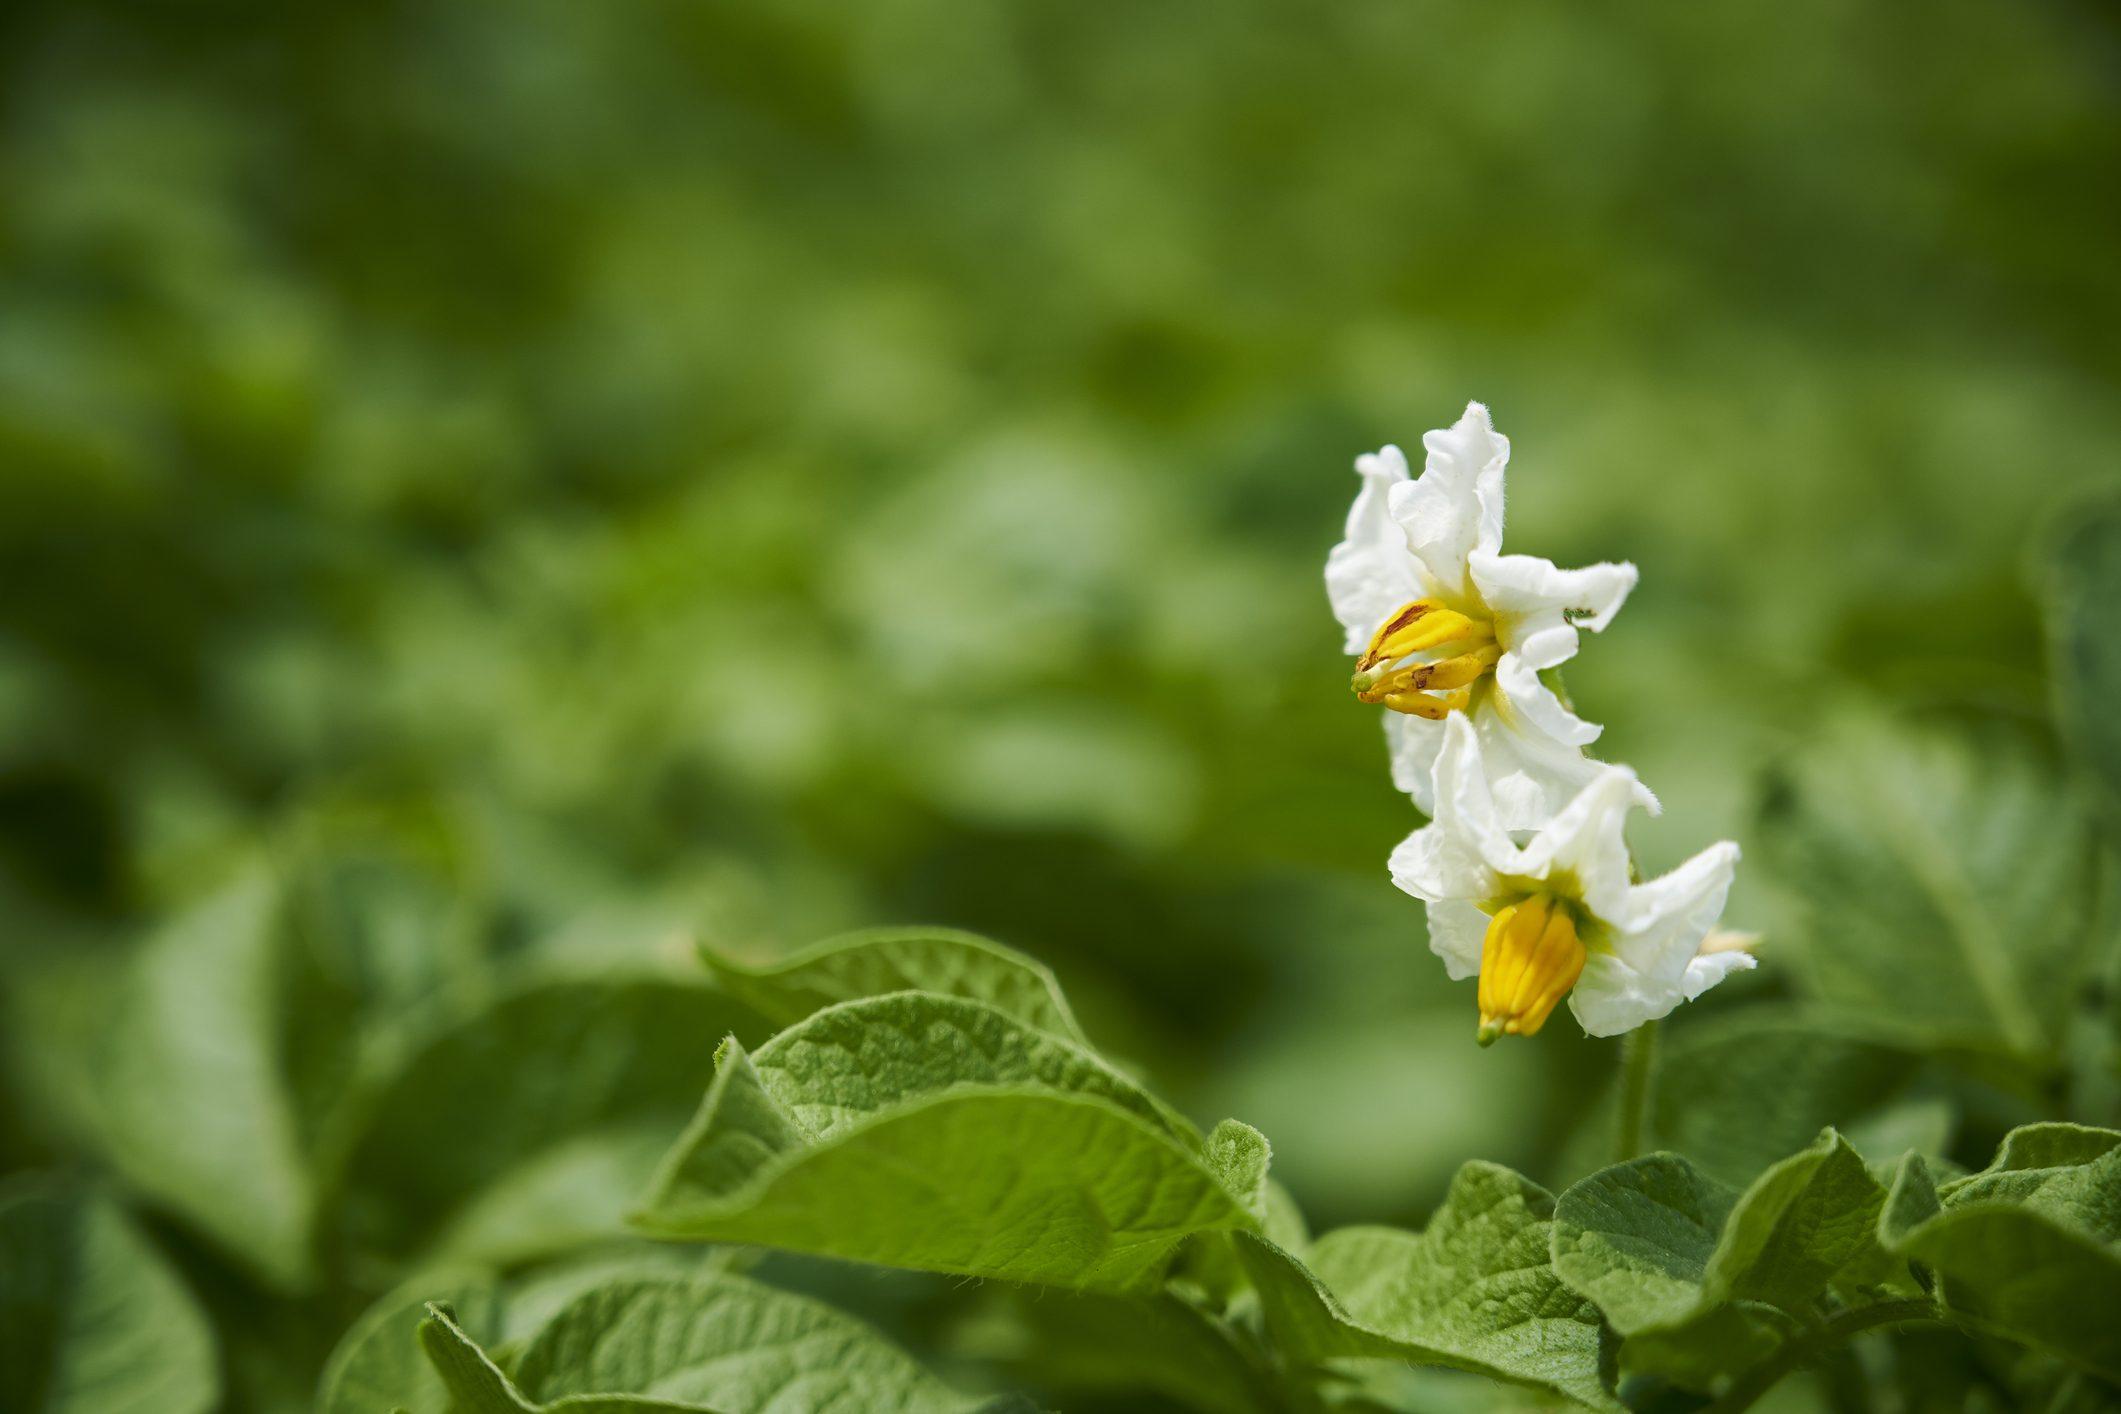 pianta-patate-storia